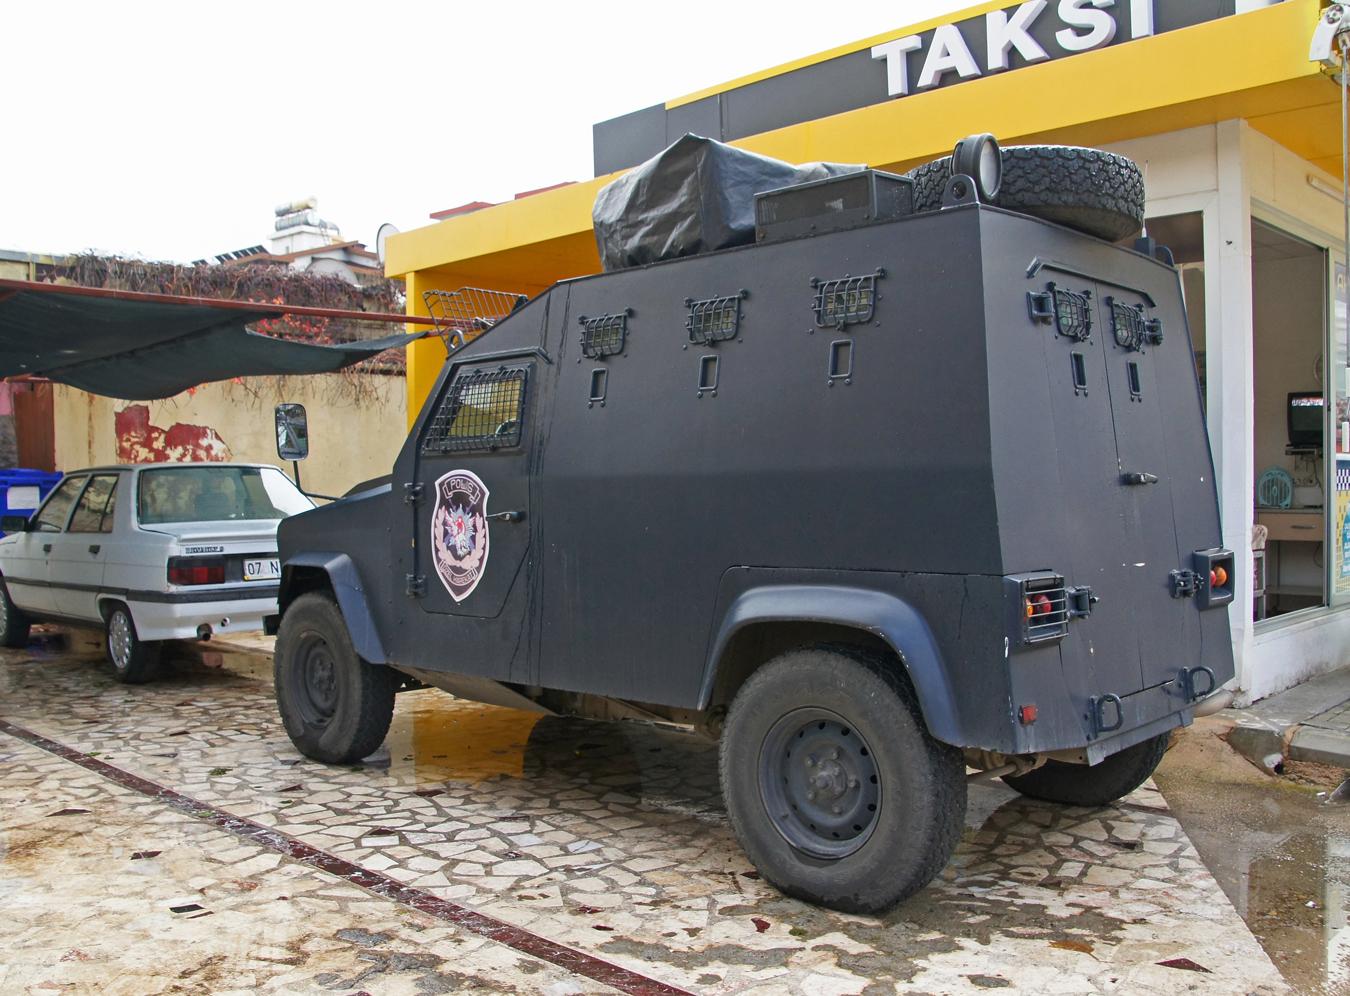 Бронеавтомобиль. Турция, Аланья